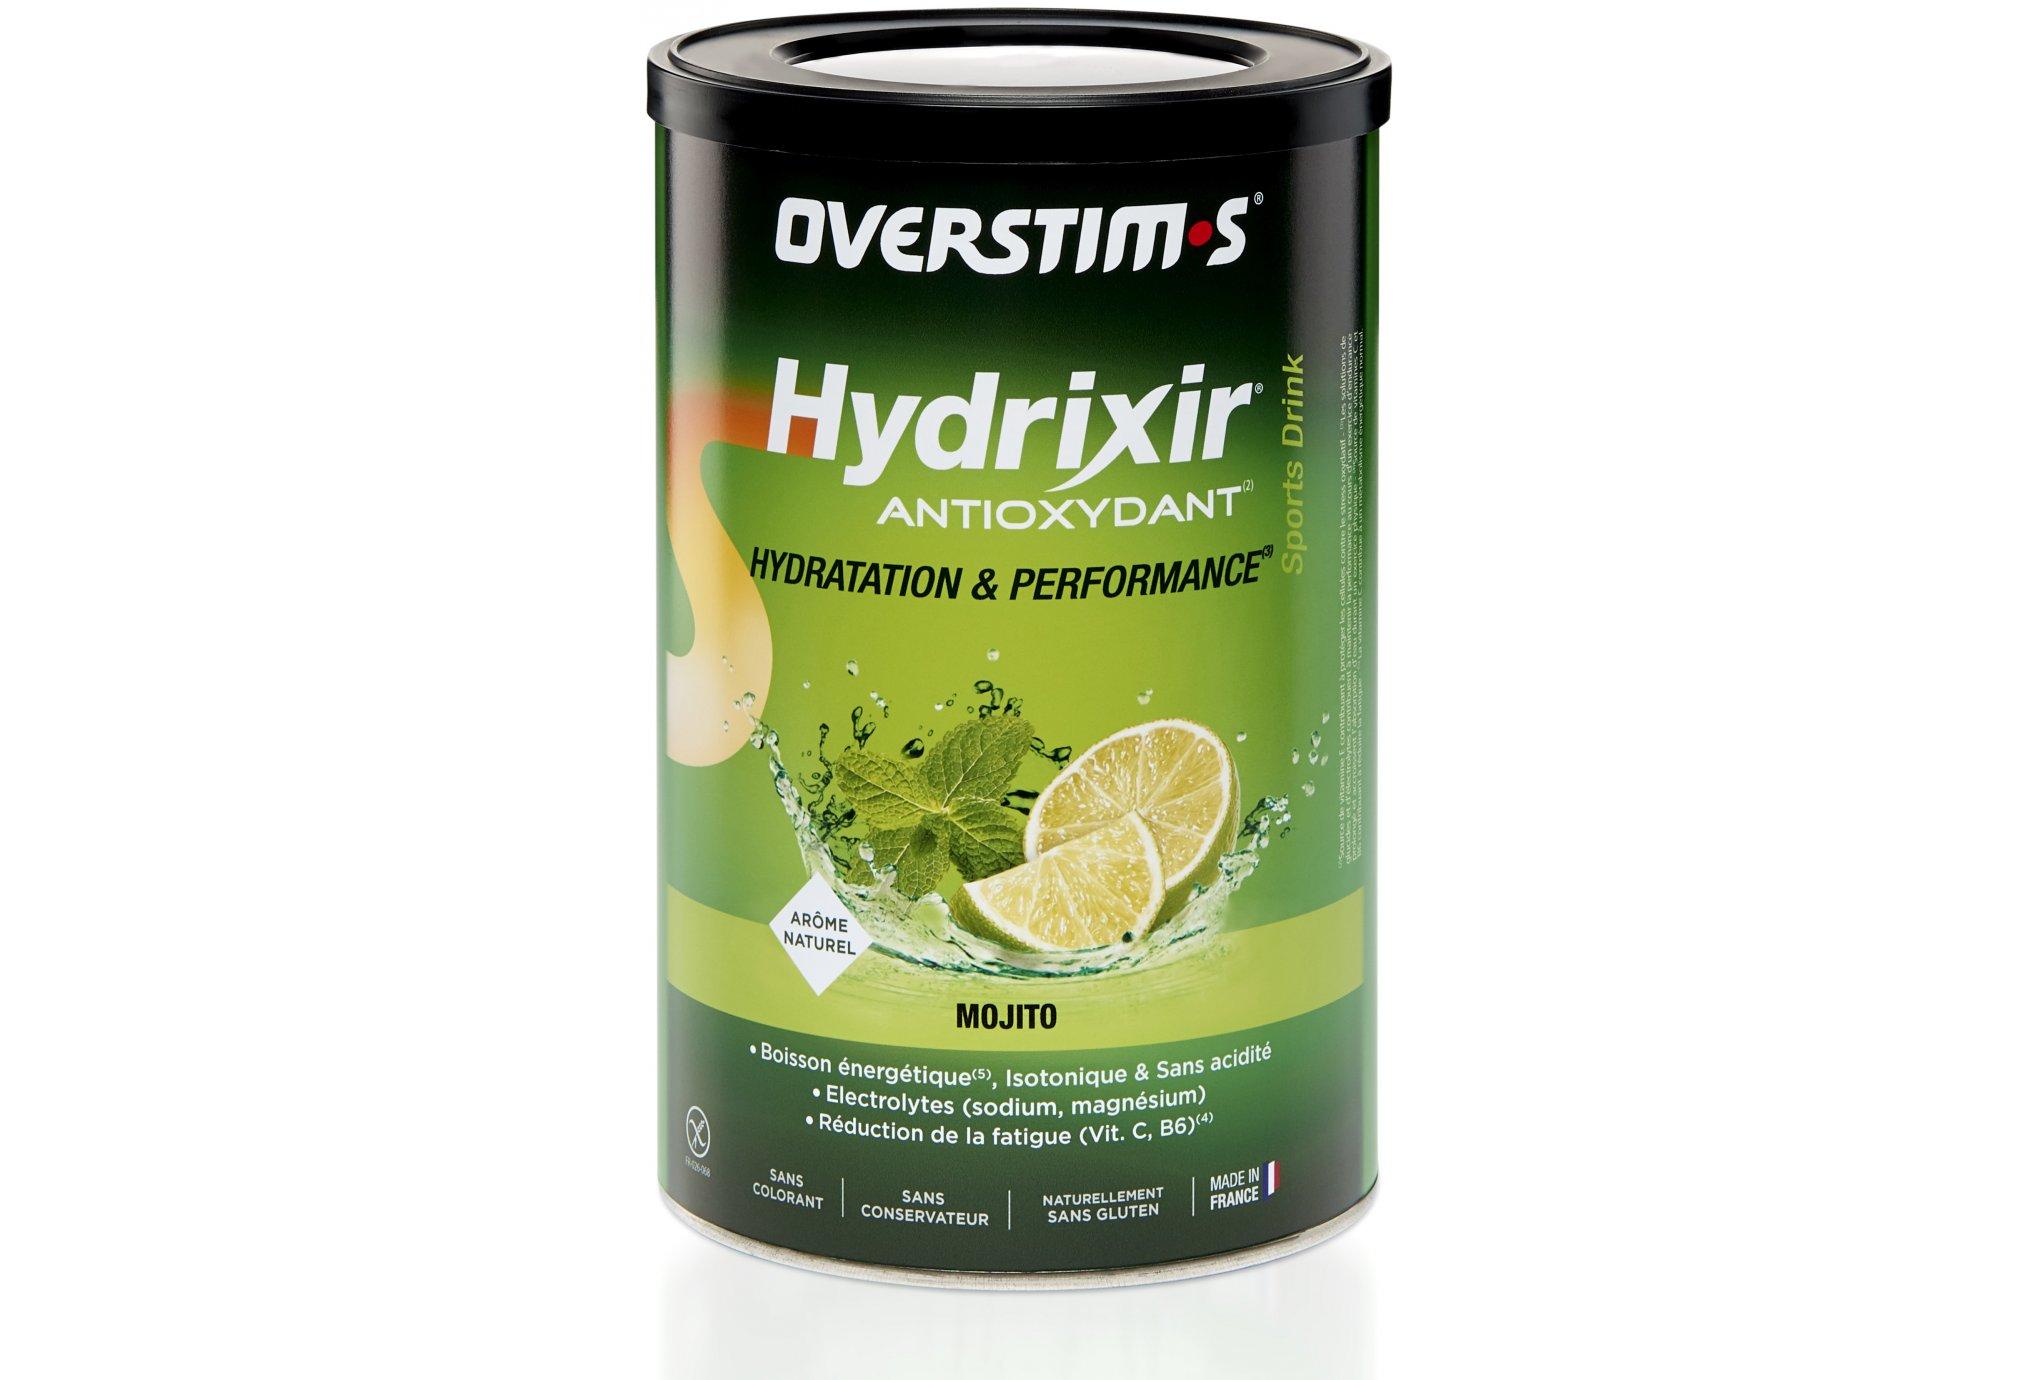 OVERSTIMS Hydrixir 600g - Mojito Diététique Boissons